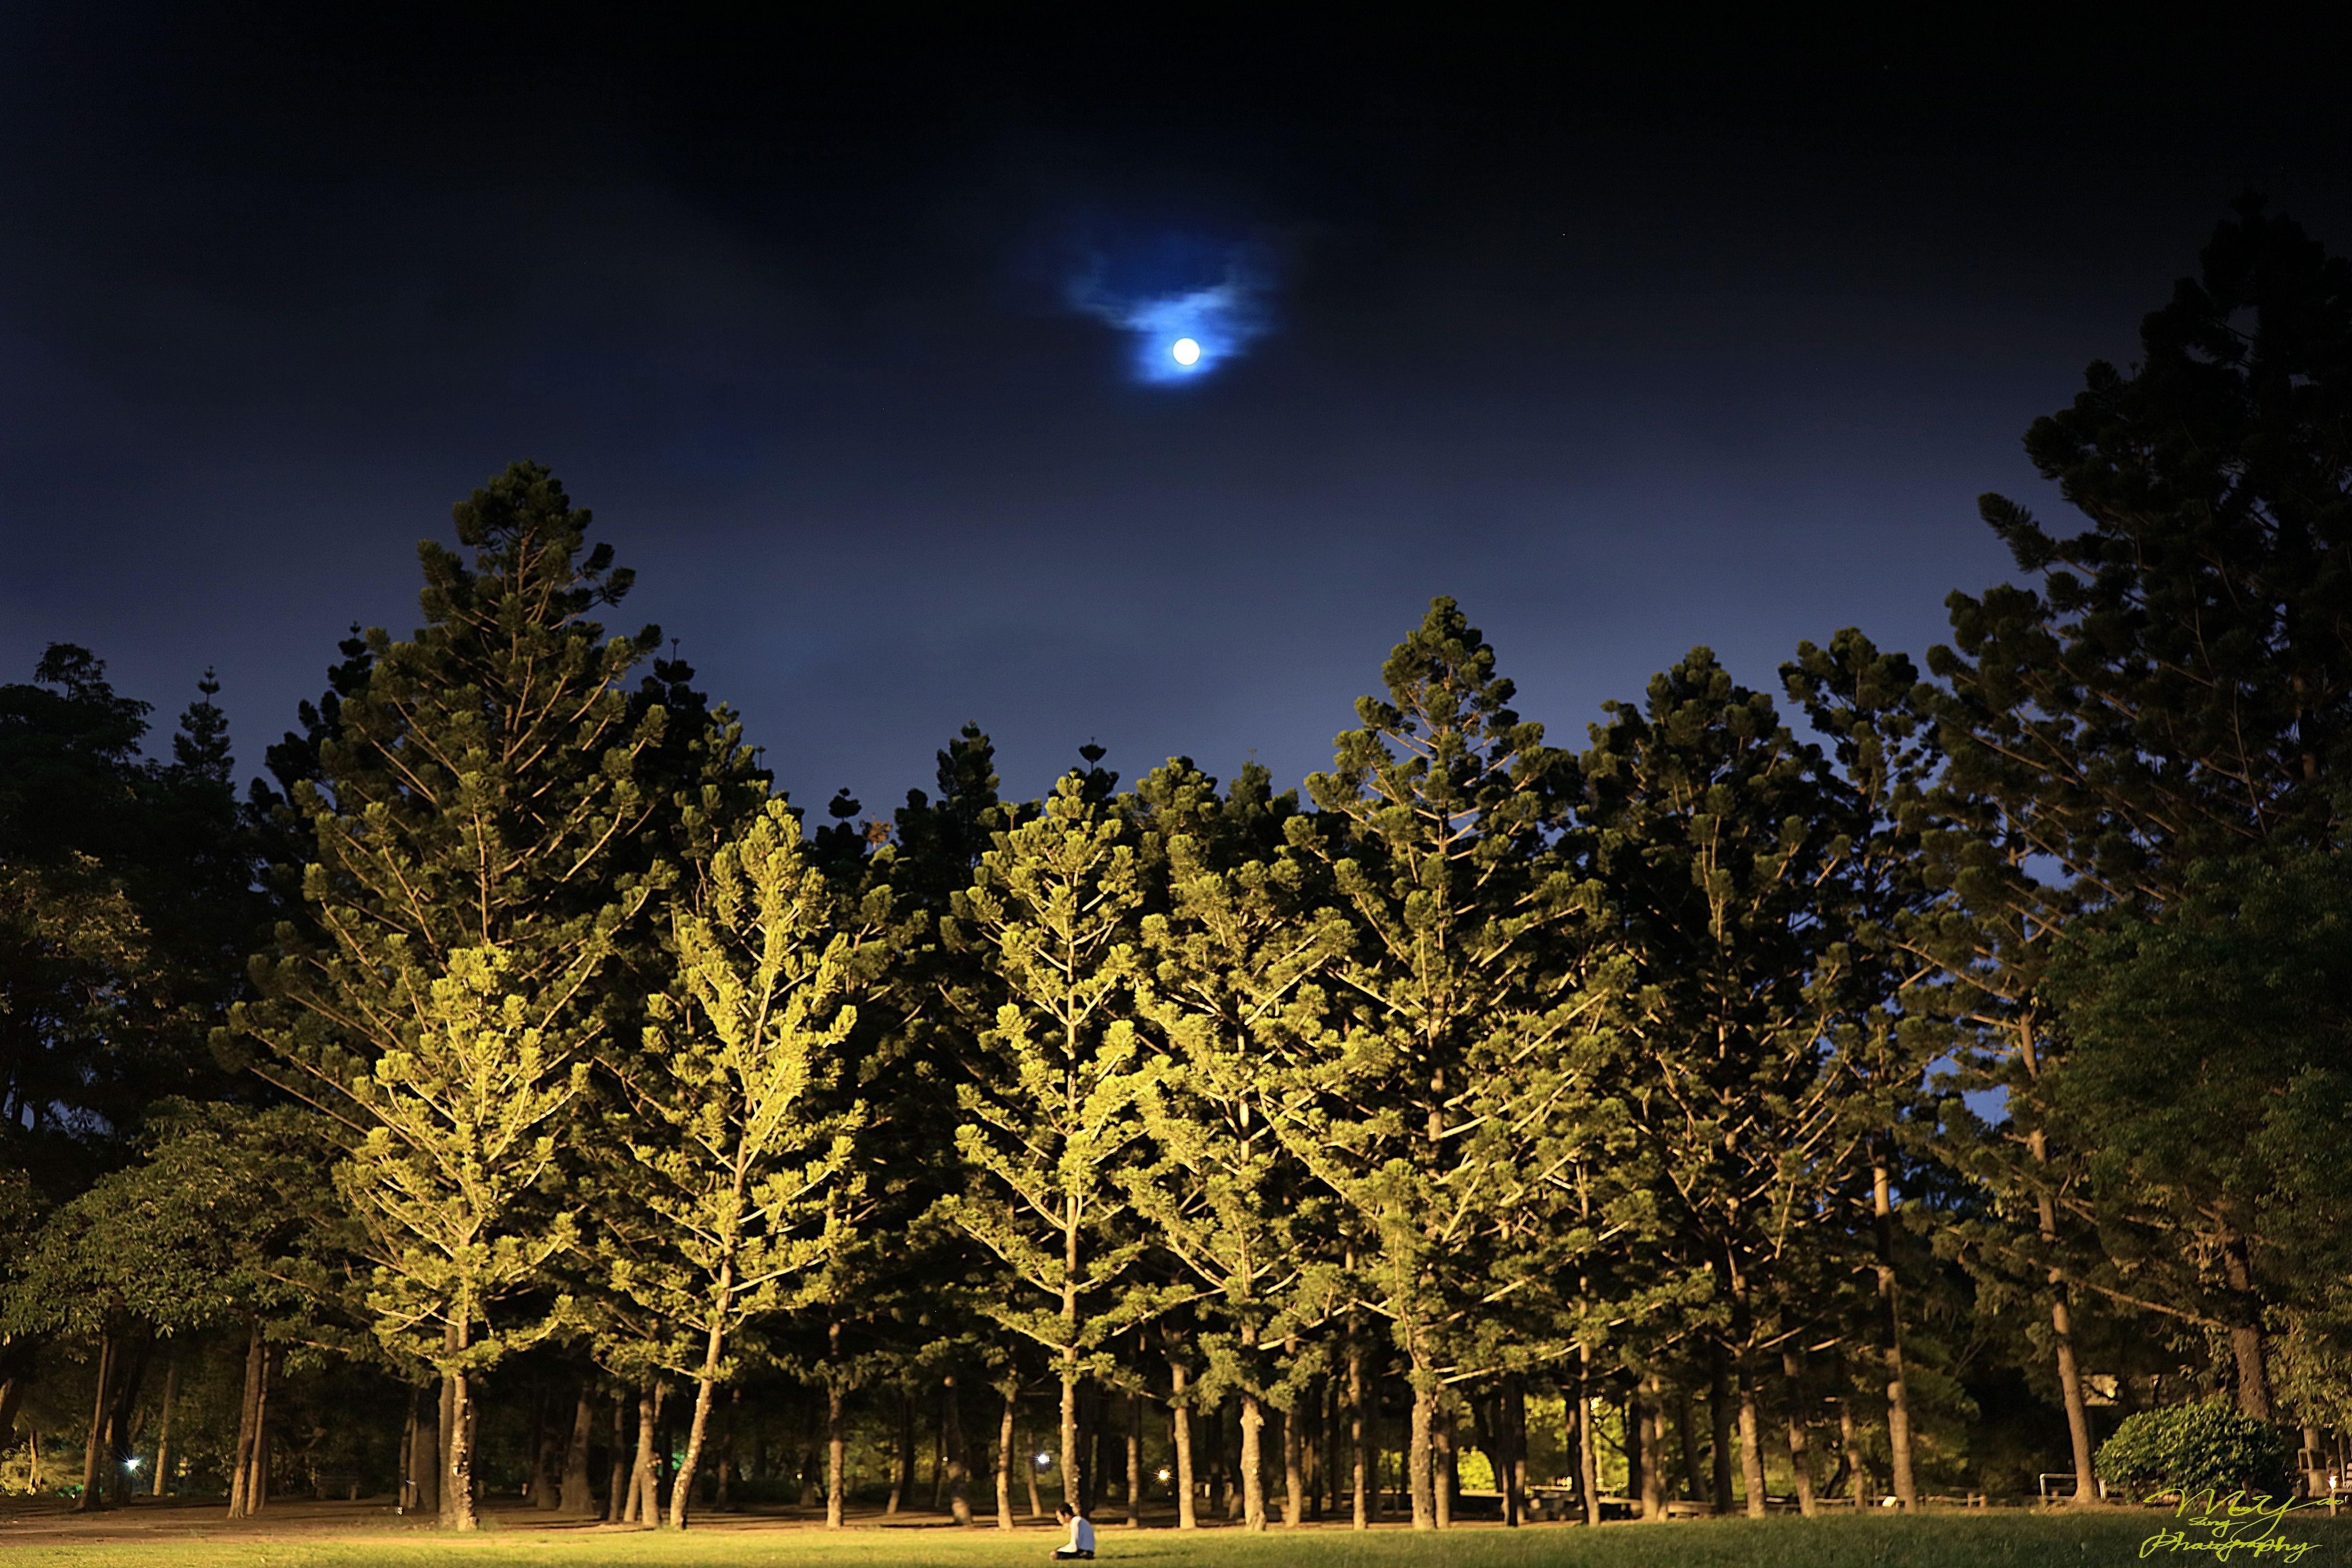 Transcendental Meditation ~ Tainan Park, North District, Tainan City, Taiwan